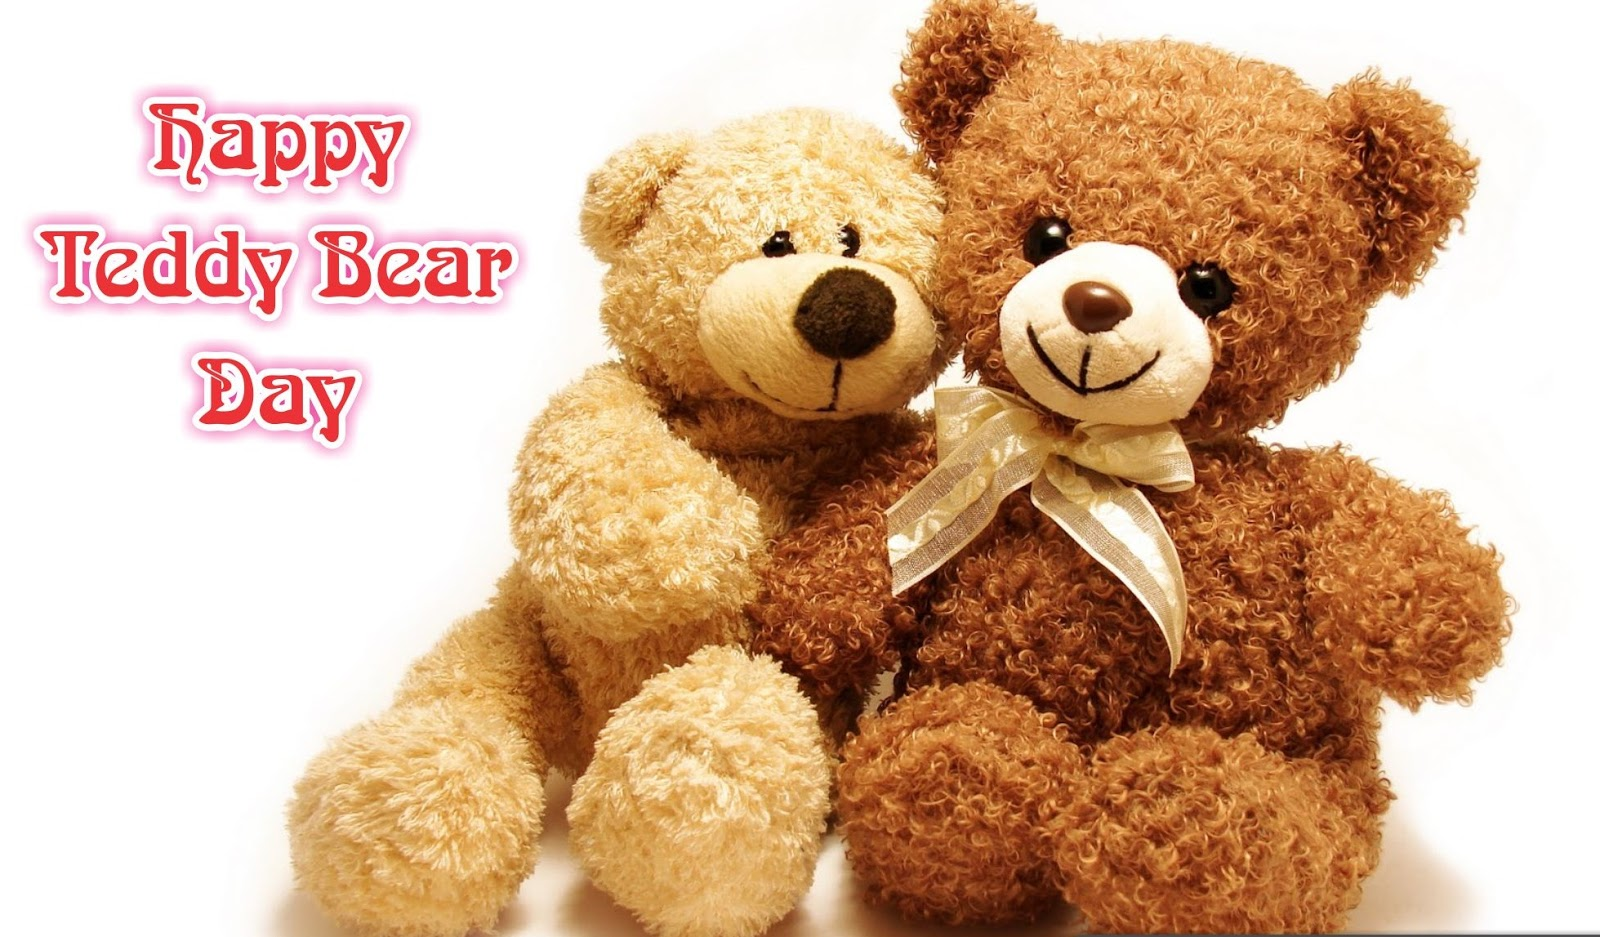 Happy Teddy Bear Day 2018 Shayari in Hindi & English font for lovers